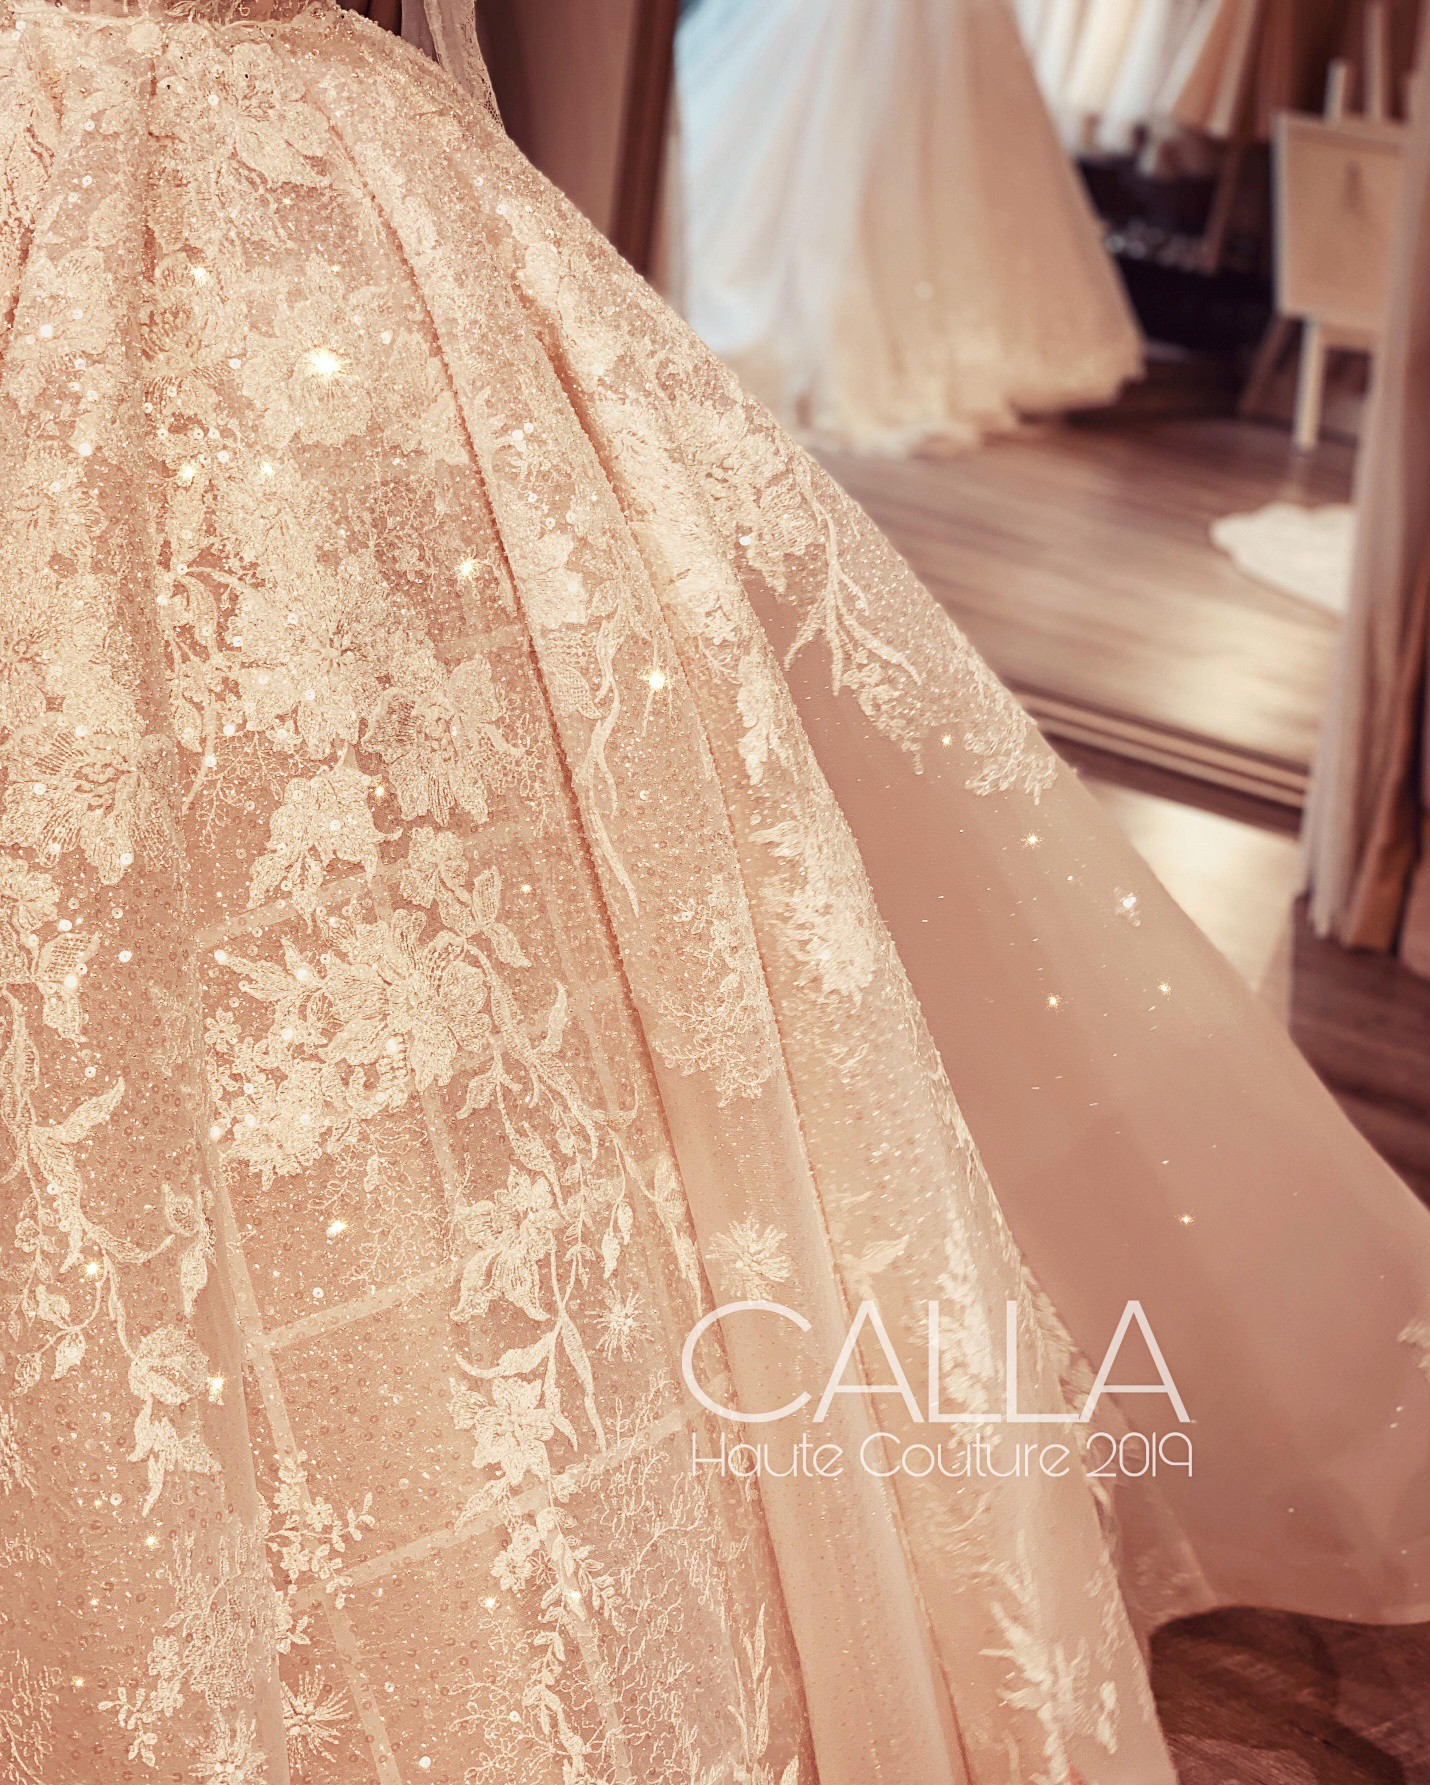 Calla Bridal ra mắt dòng sản phẩm cao cấp Calla Haute Couture 2019 - Ảnh 7.